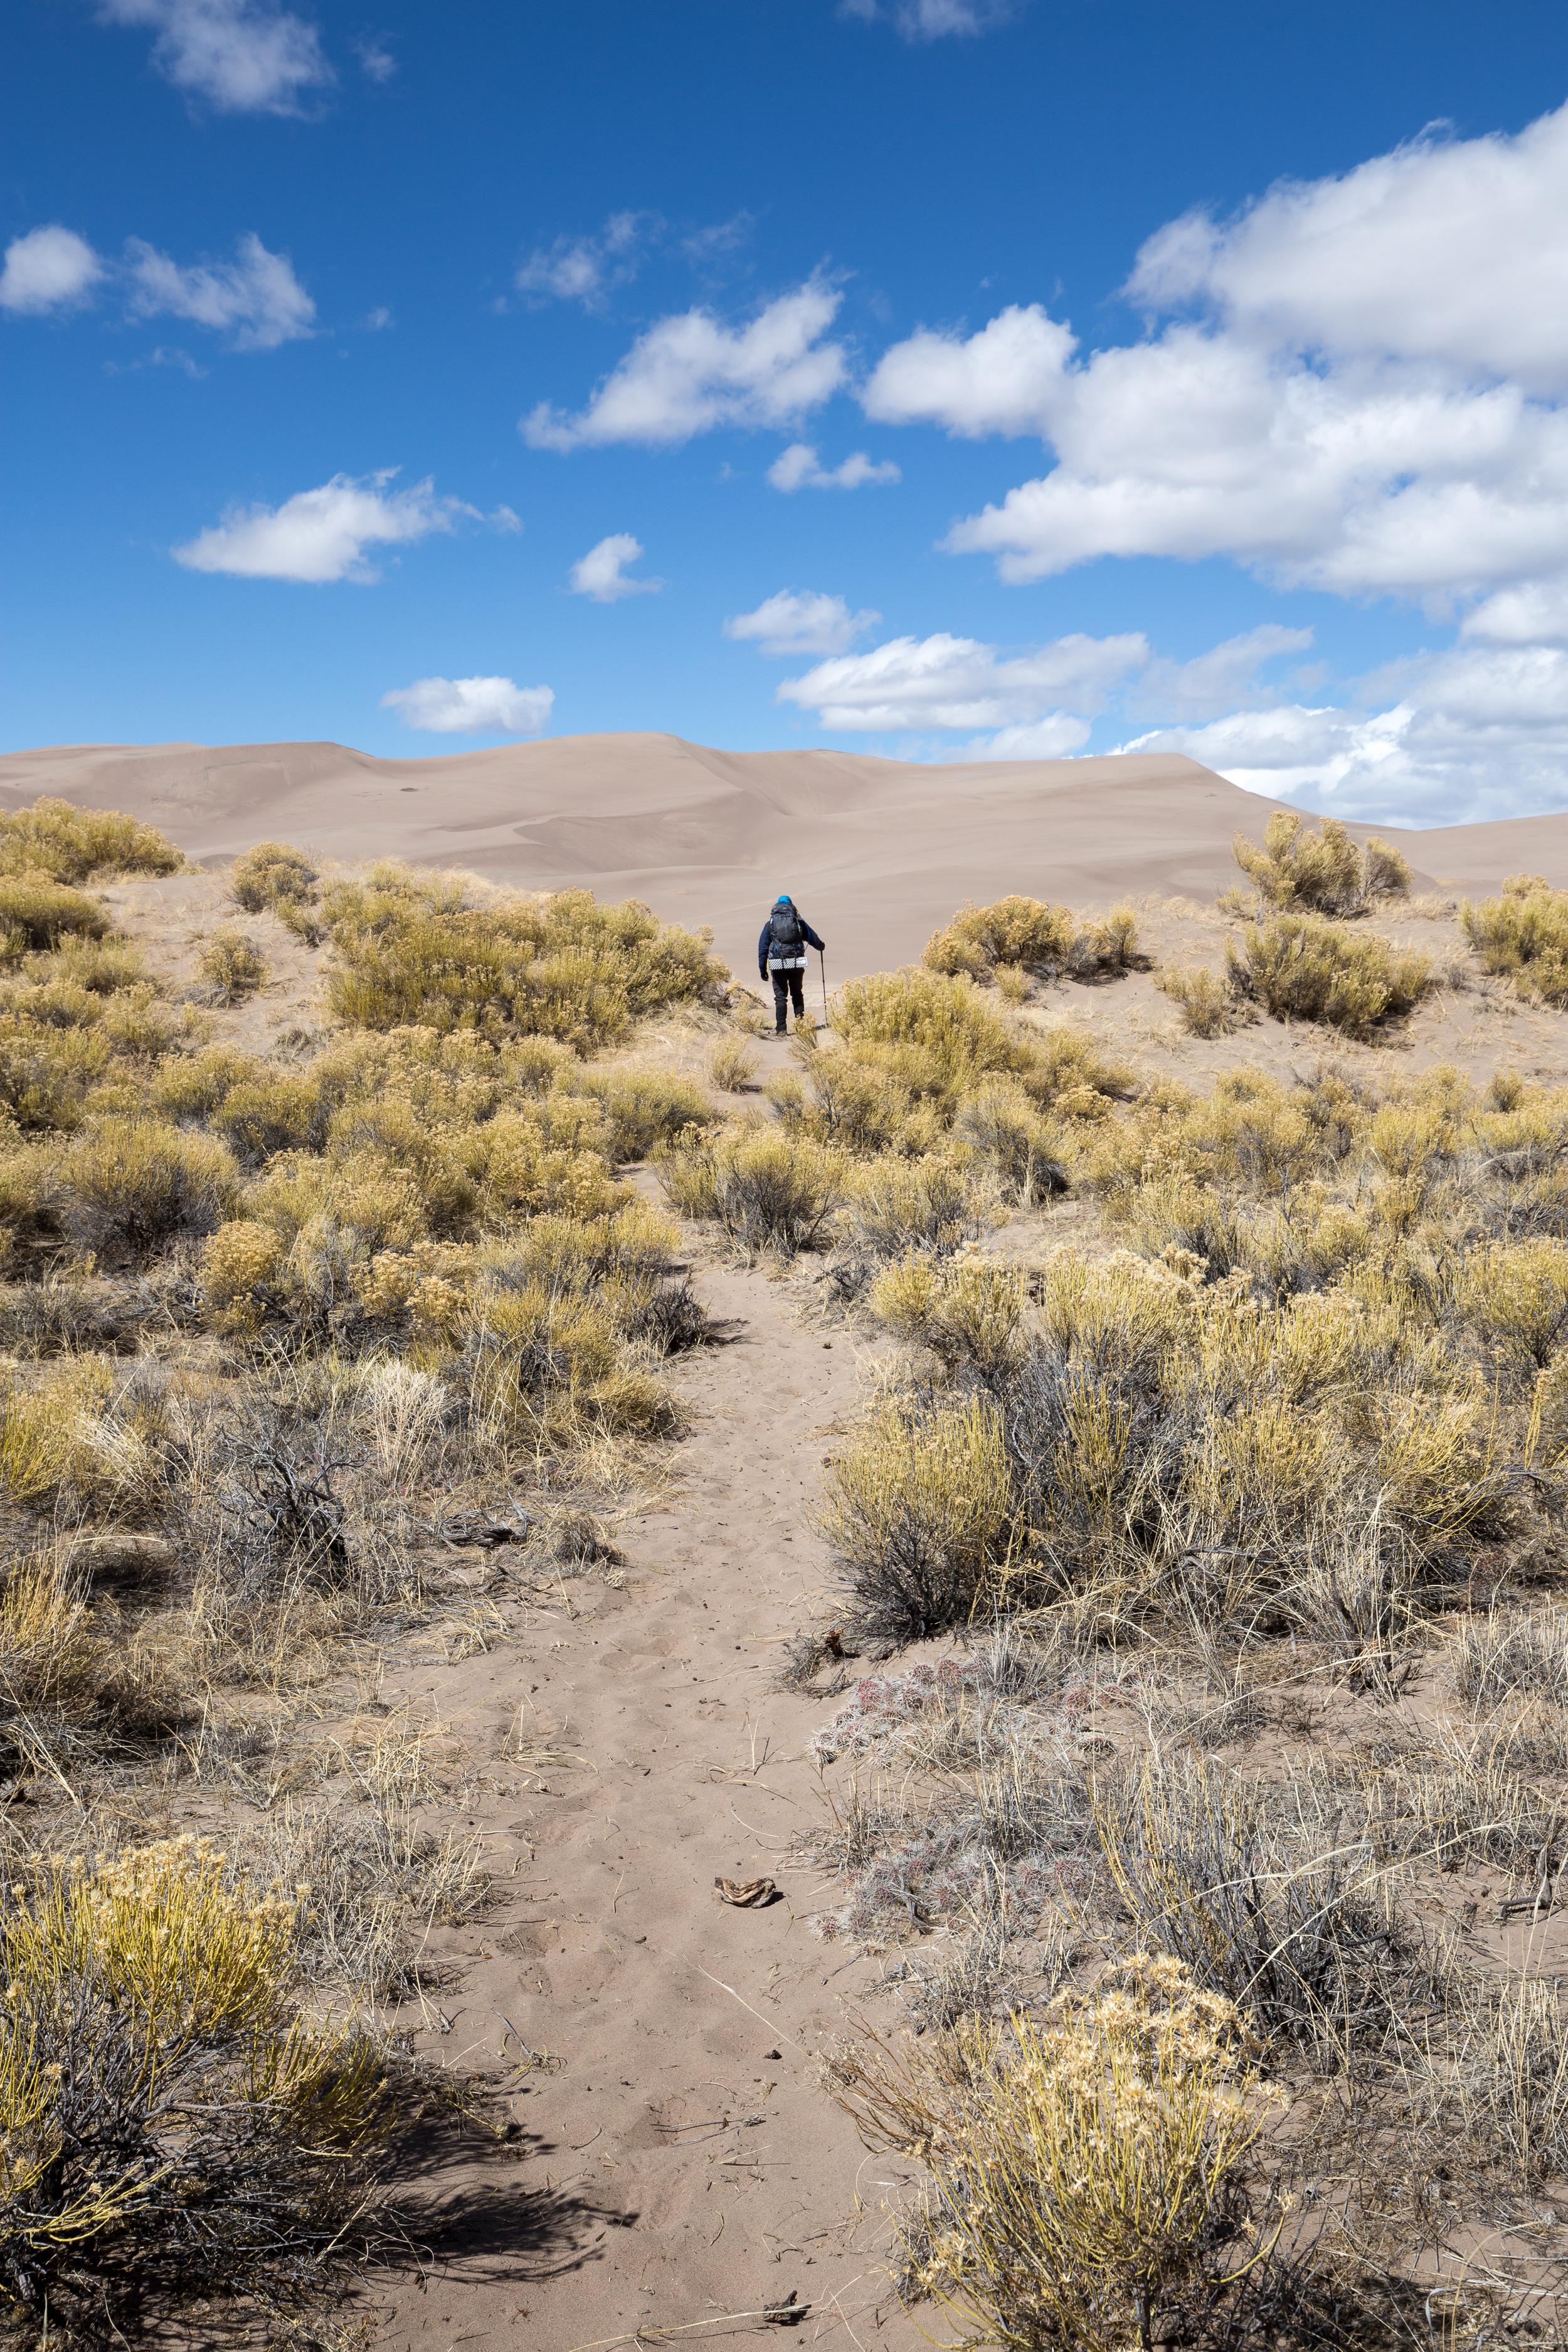 the national parks girl_great sand dunes national park_great sand dunes_hiking_backcountry hike_canon6d.JPG